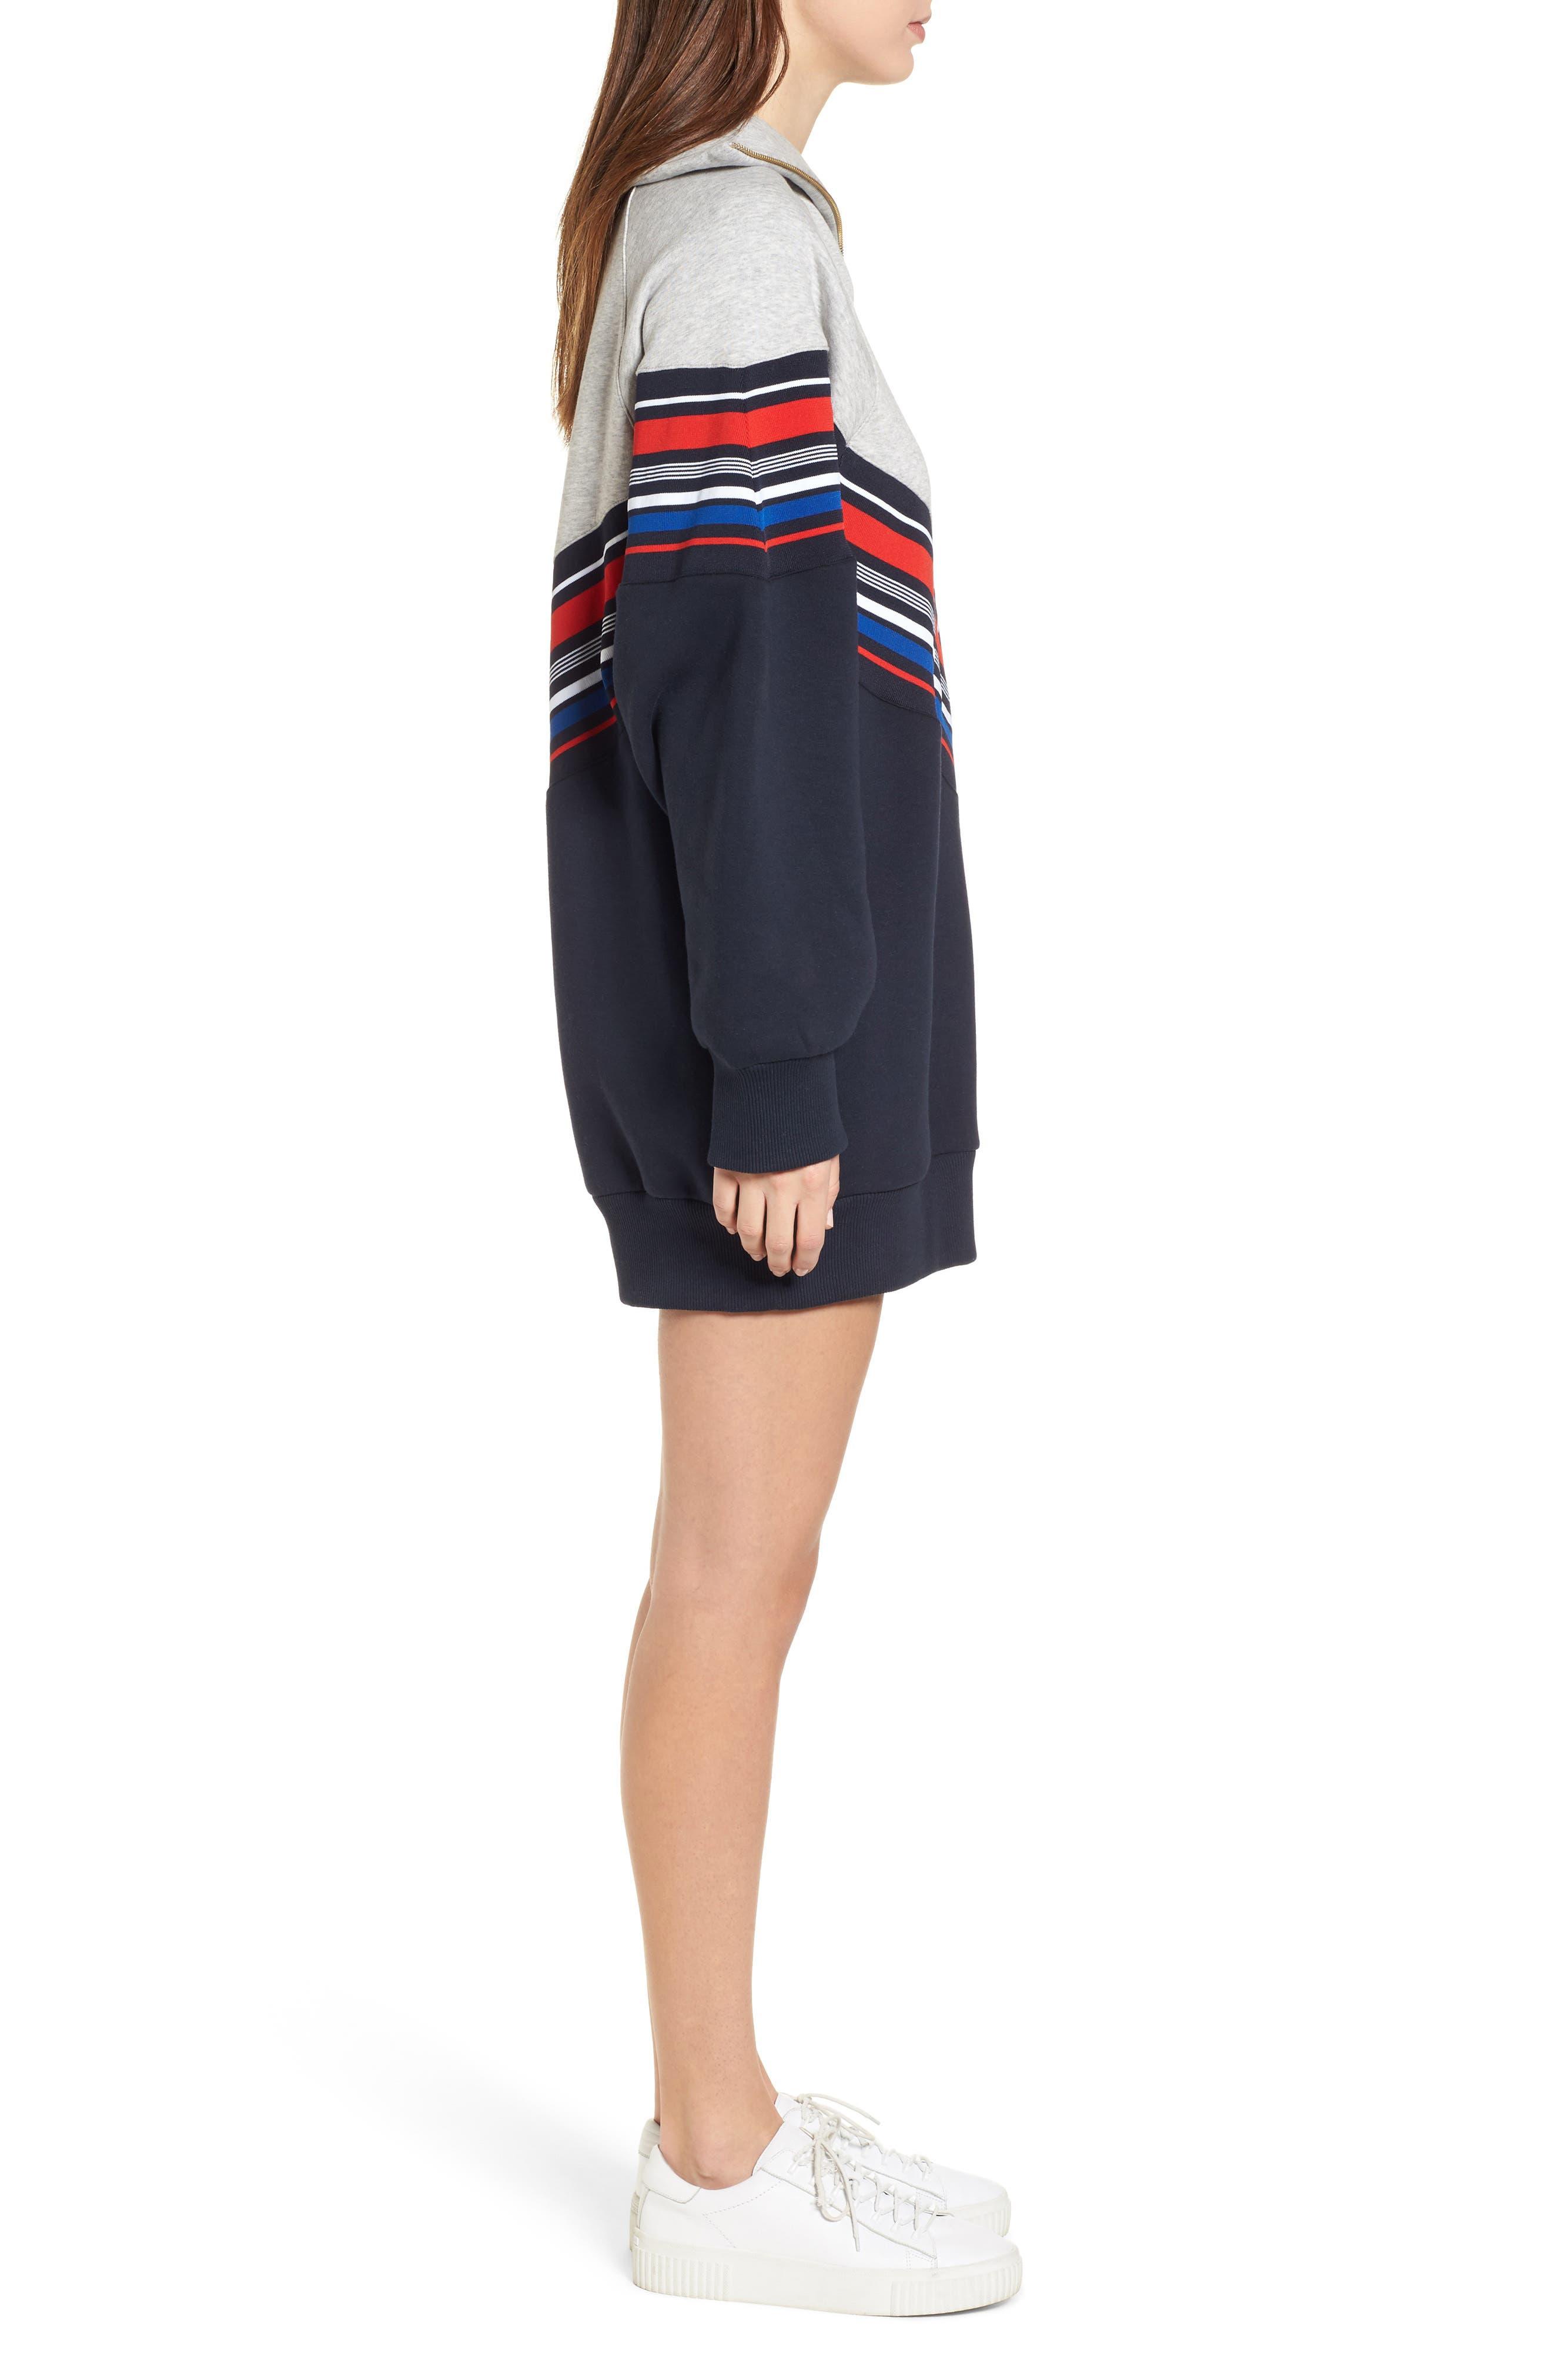 x Gigi Hadid Racing Sweatshirt Dress,                             Alternate thumbnail 3, color,                             405